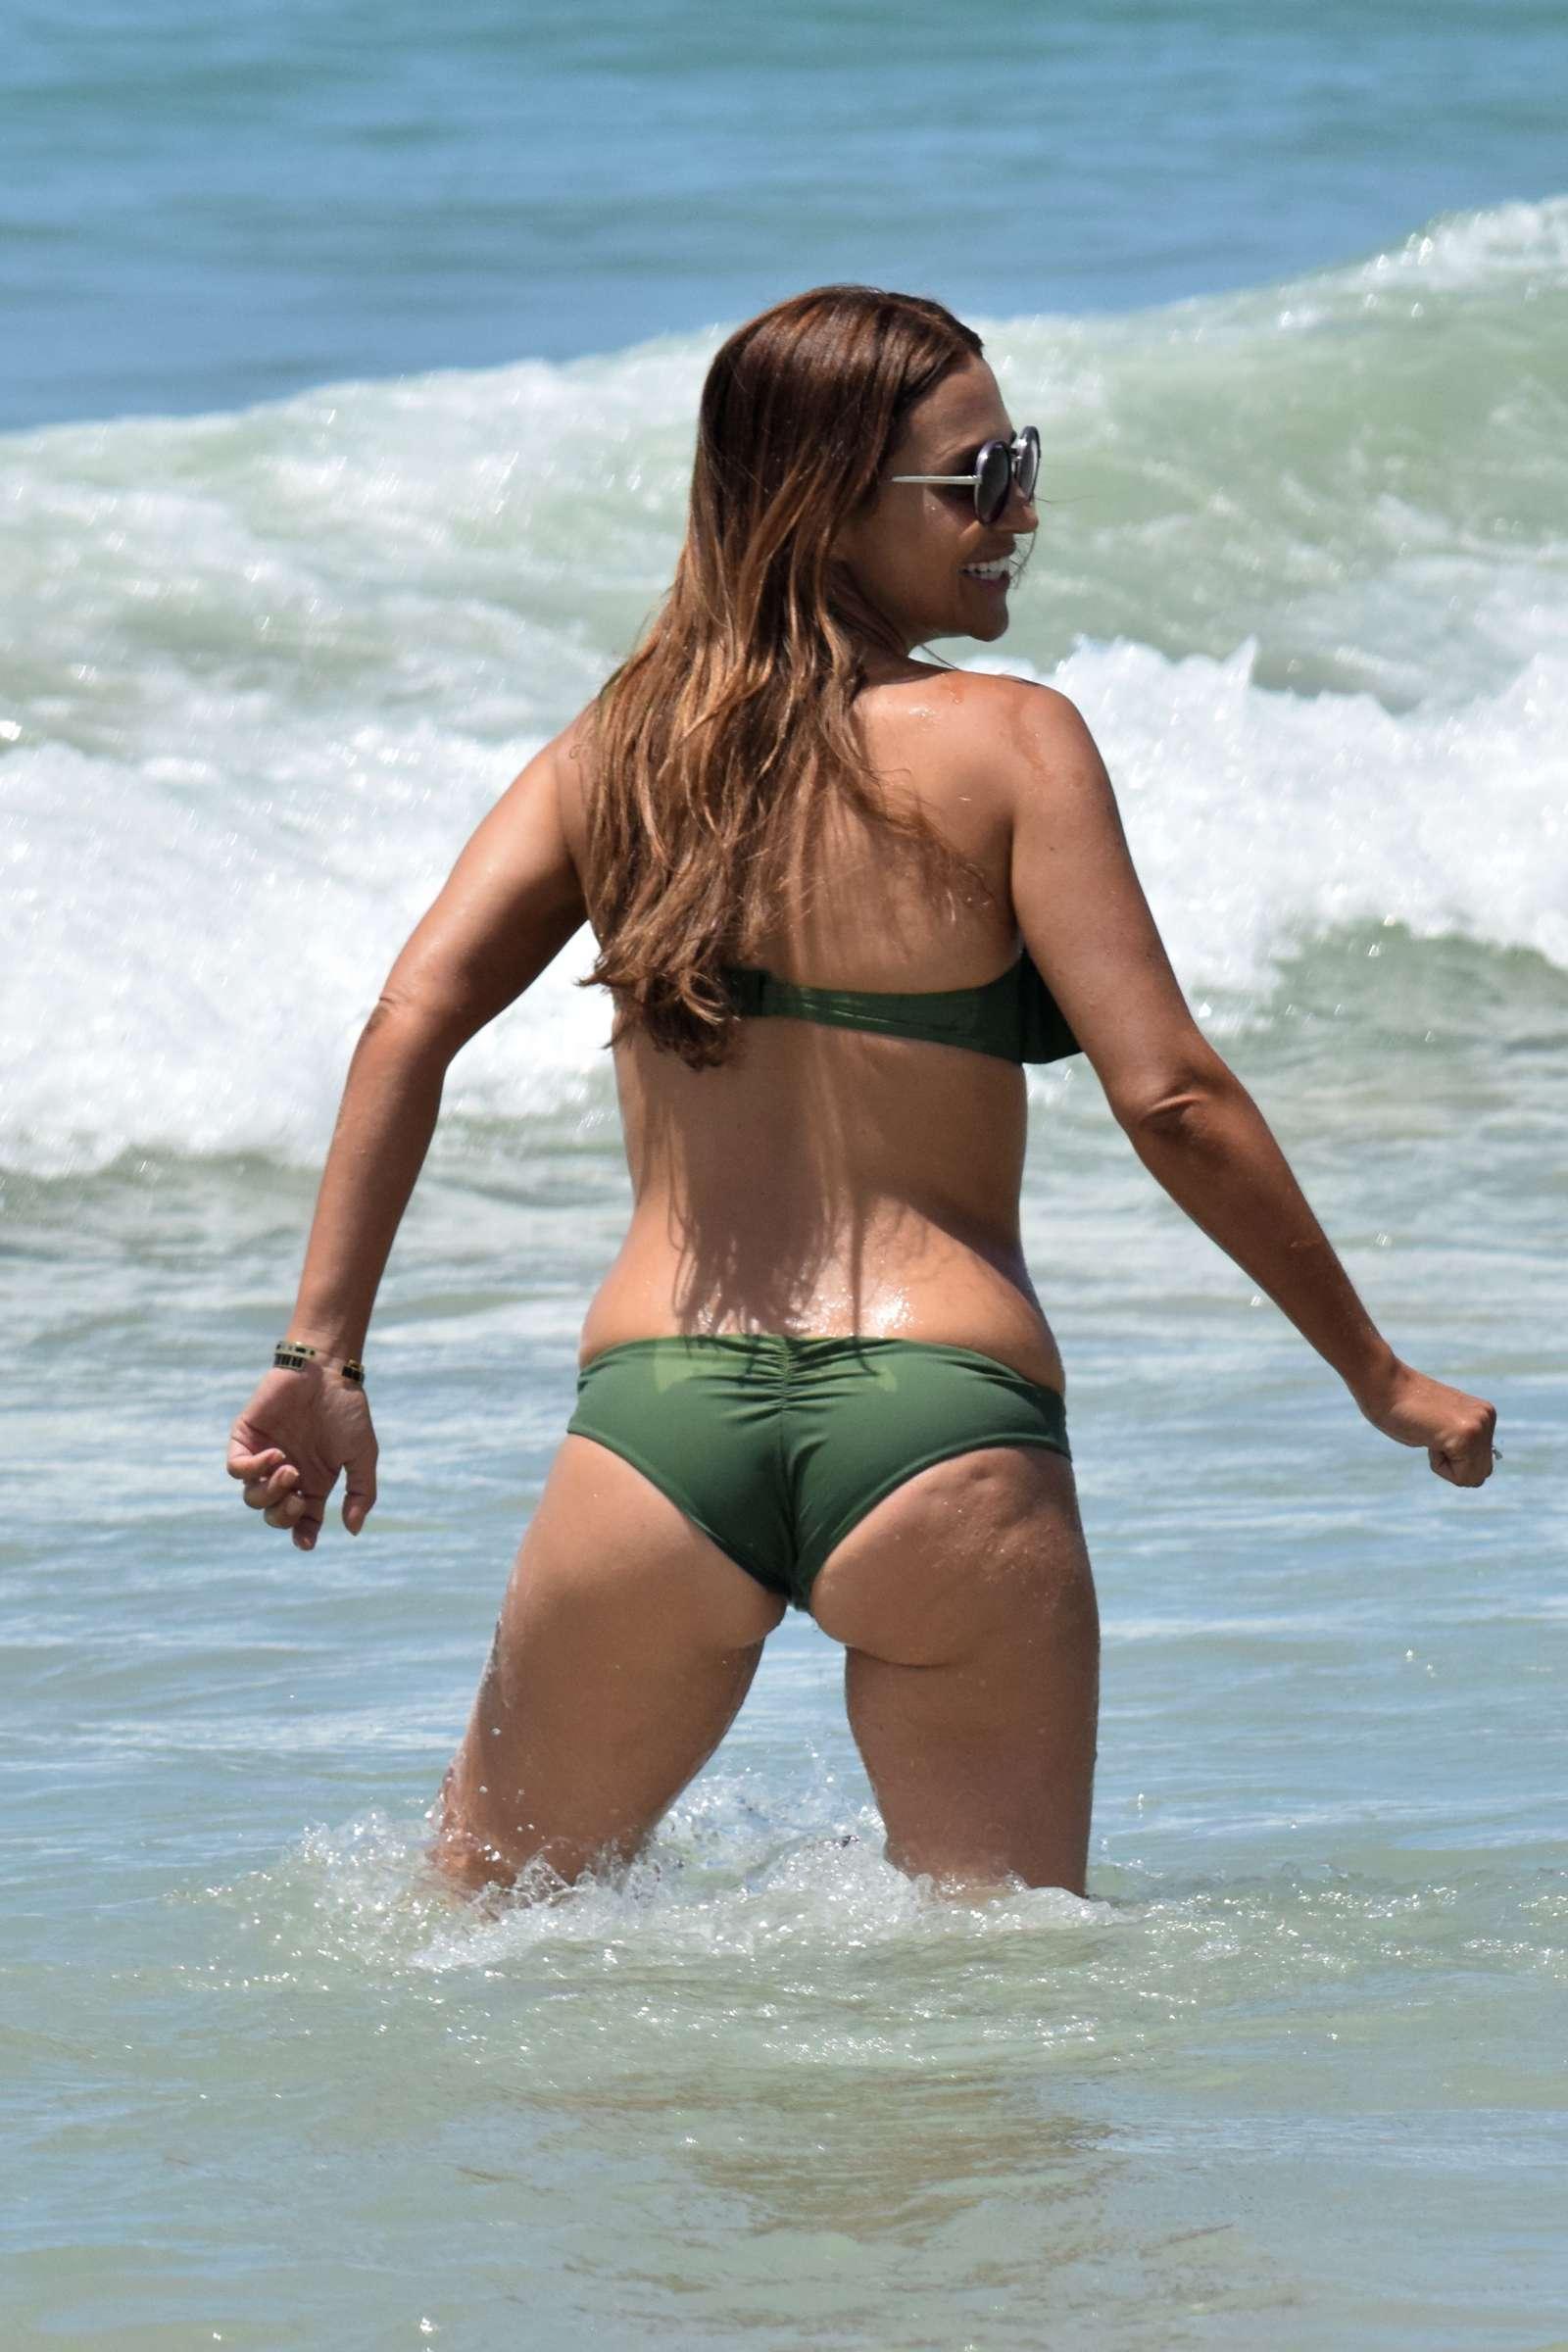 Cleavage Paula Echevarria nude (77 photos), Tits, Cleavage, Boobs, butt 2017